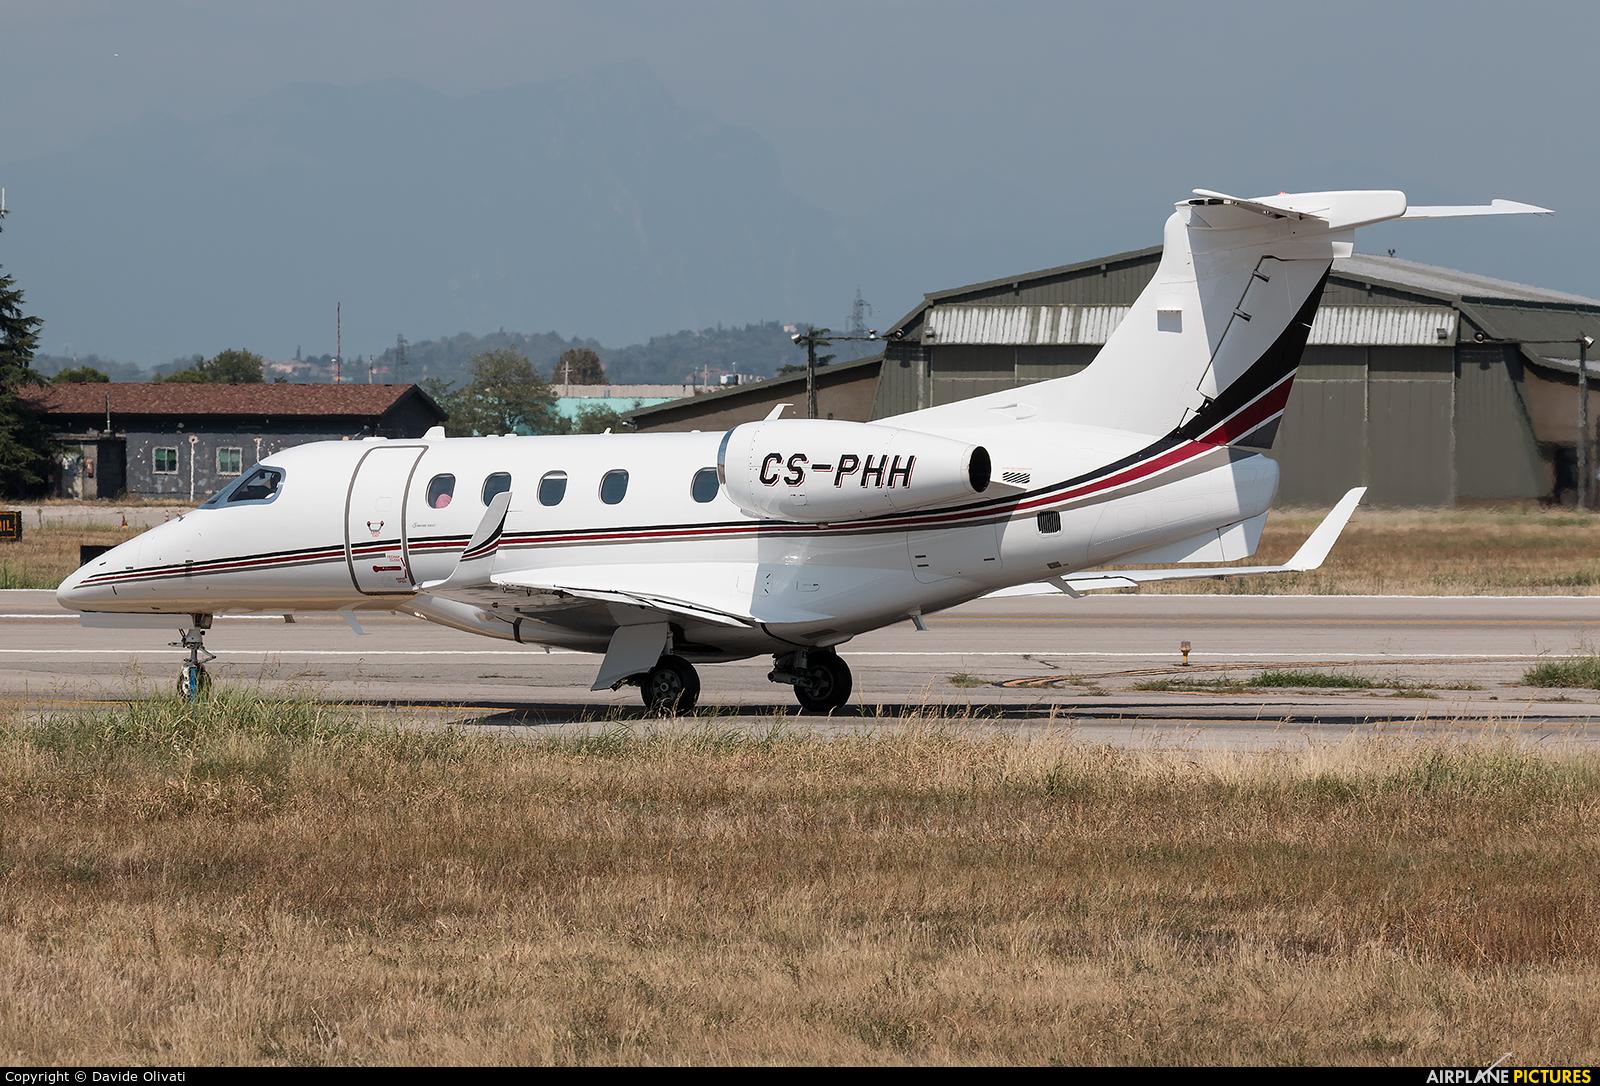 NetJets Europe (Portugal) CS-PHH aircraft at Verona - Villafranca